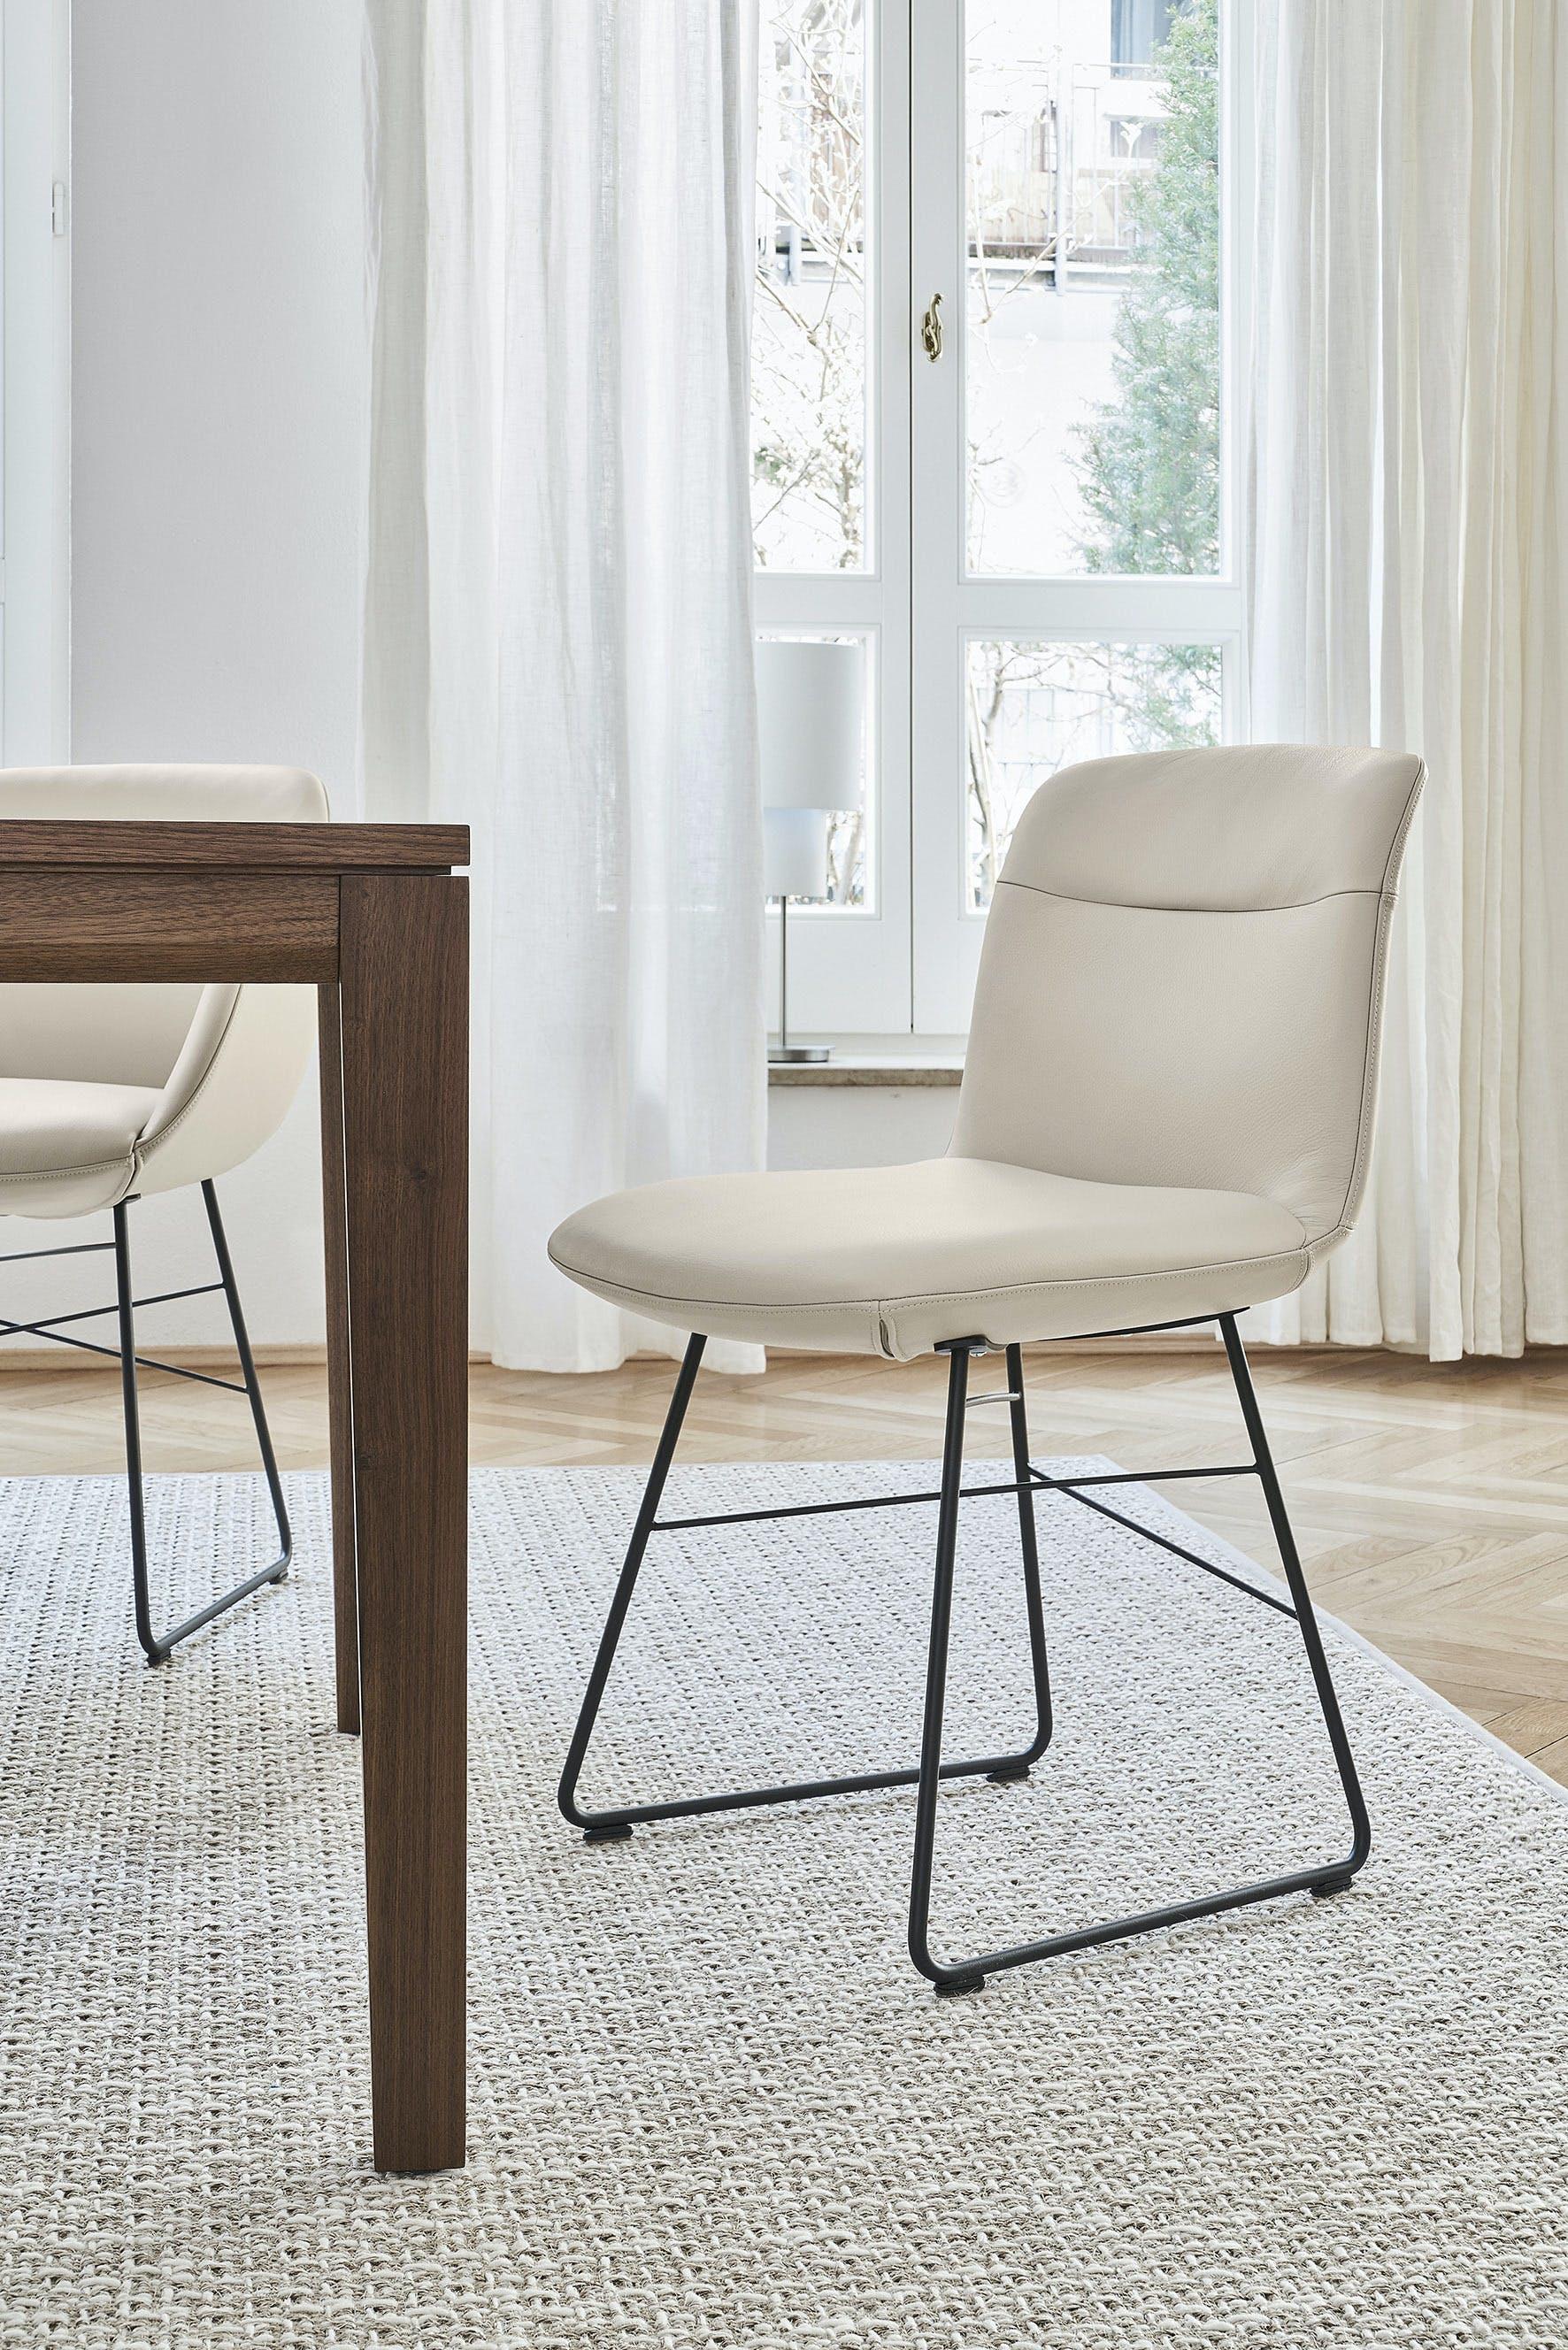 Jab Anstoetz Cara Dining Chair Sled Base Haute Living